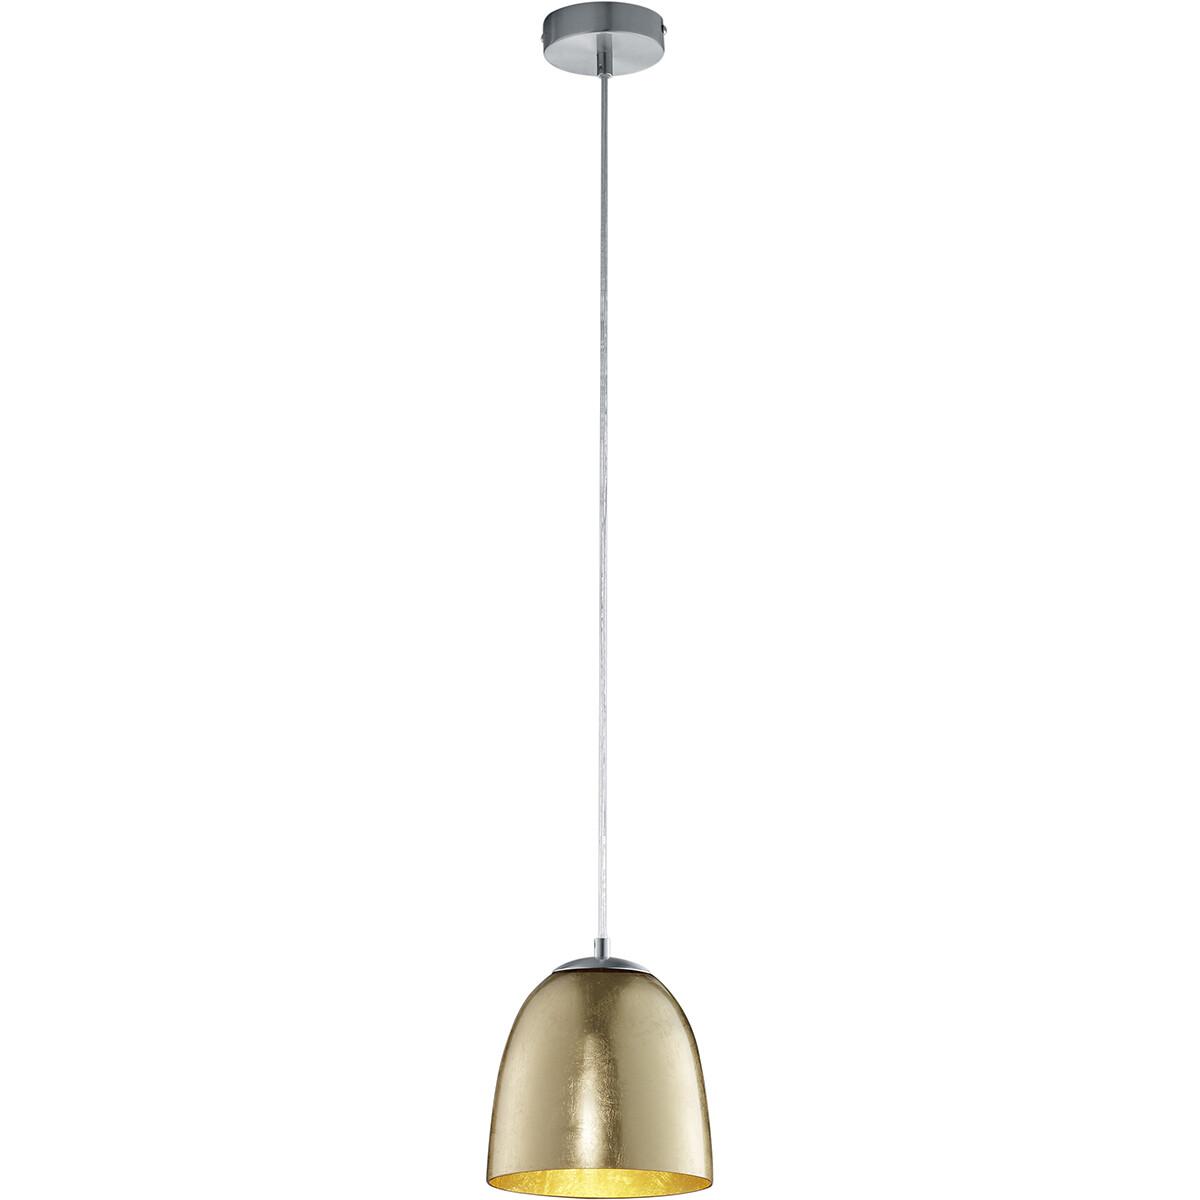 LED Hanglamp - Hangverlichting - Trion Onutia - E14 Fitting - 1-lichts - Ovaal - Mat Goud - Aluminiu